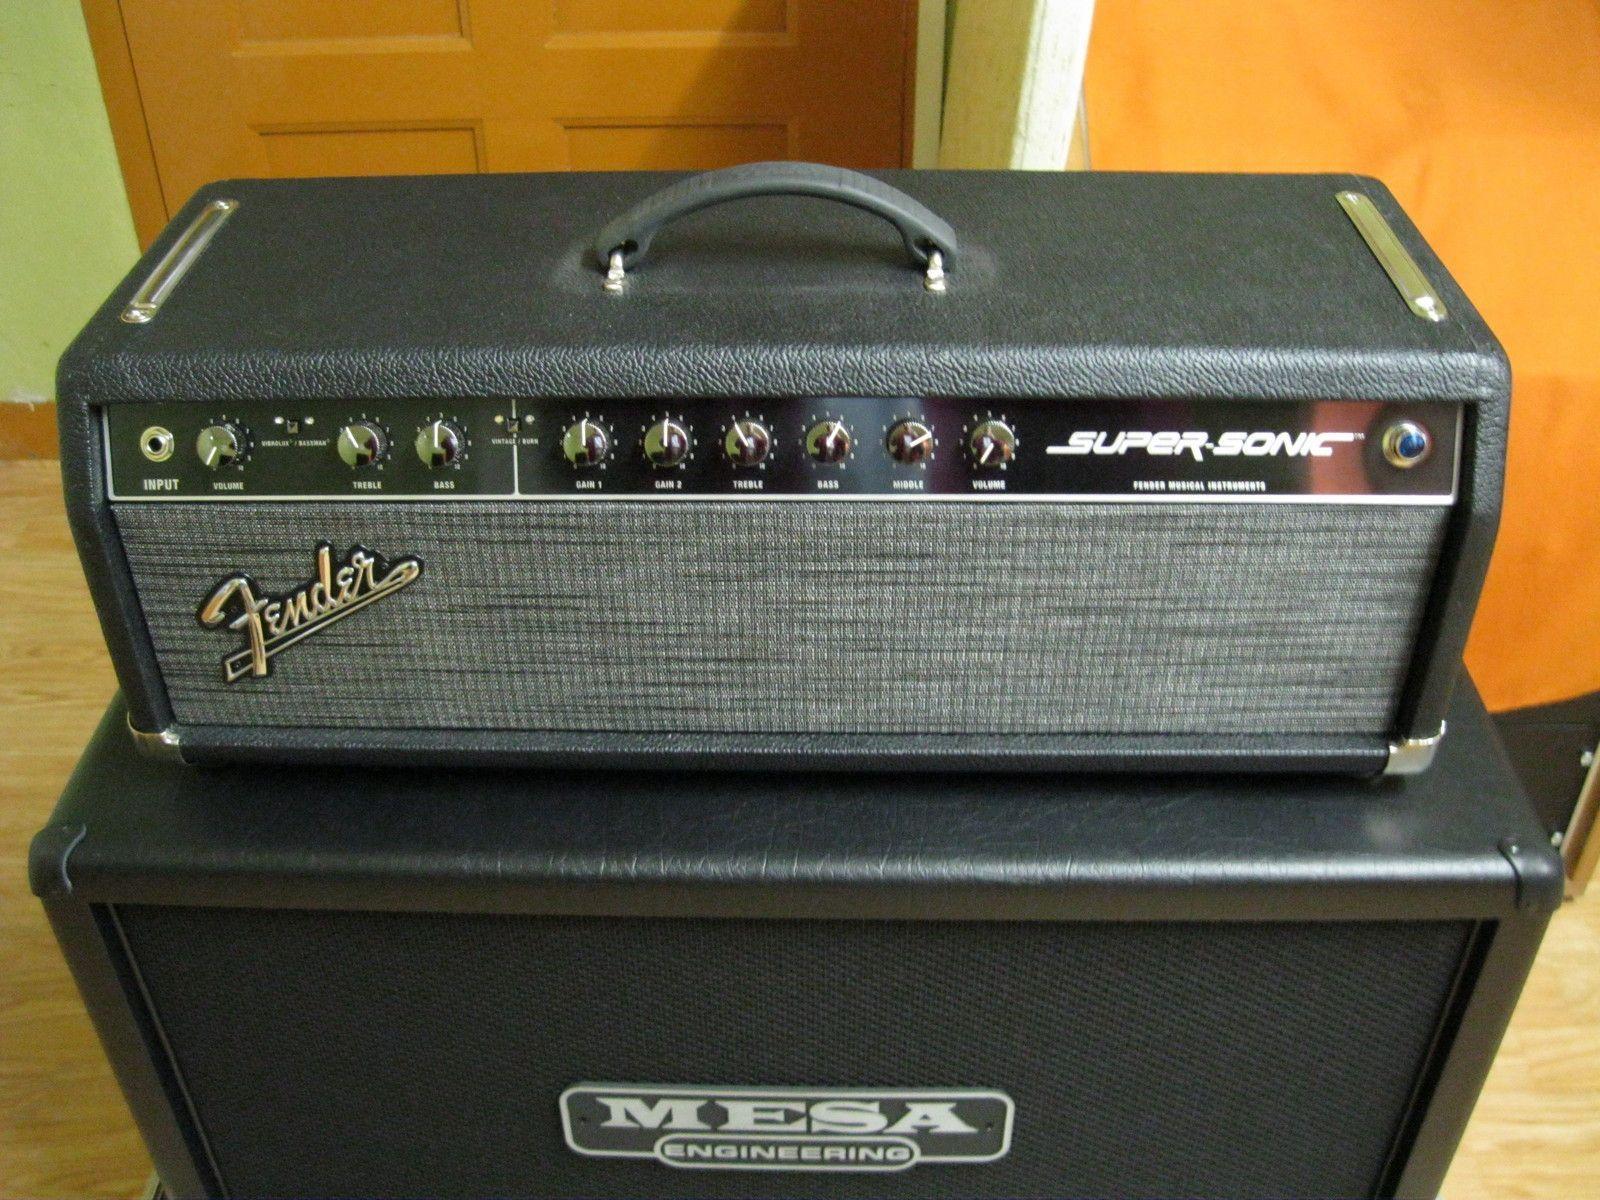 fender super sonic 60 head image 927499 audiofanzine rh en audiofanzine com Fender Guitar Head Fender Super-Sonic Head Back Panel